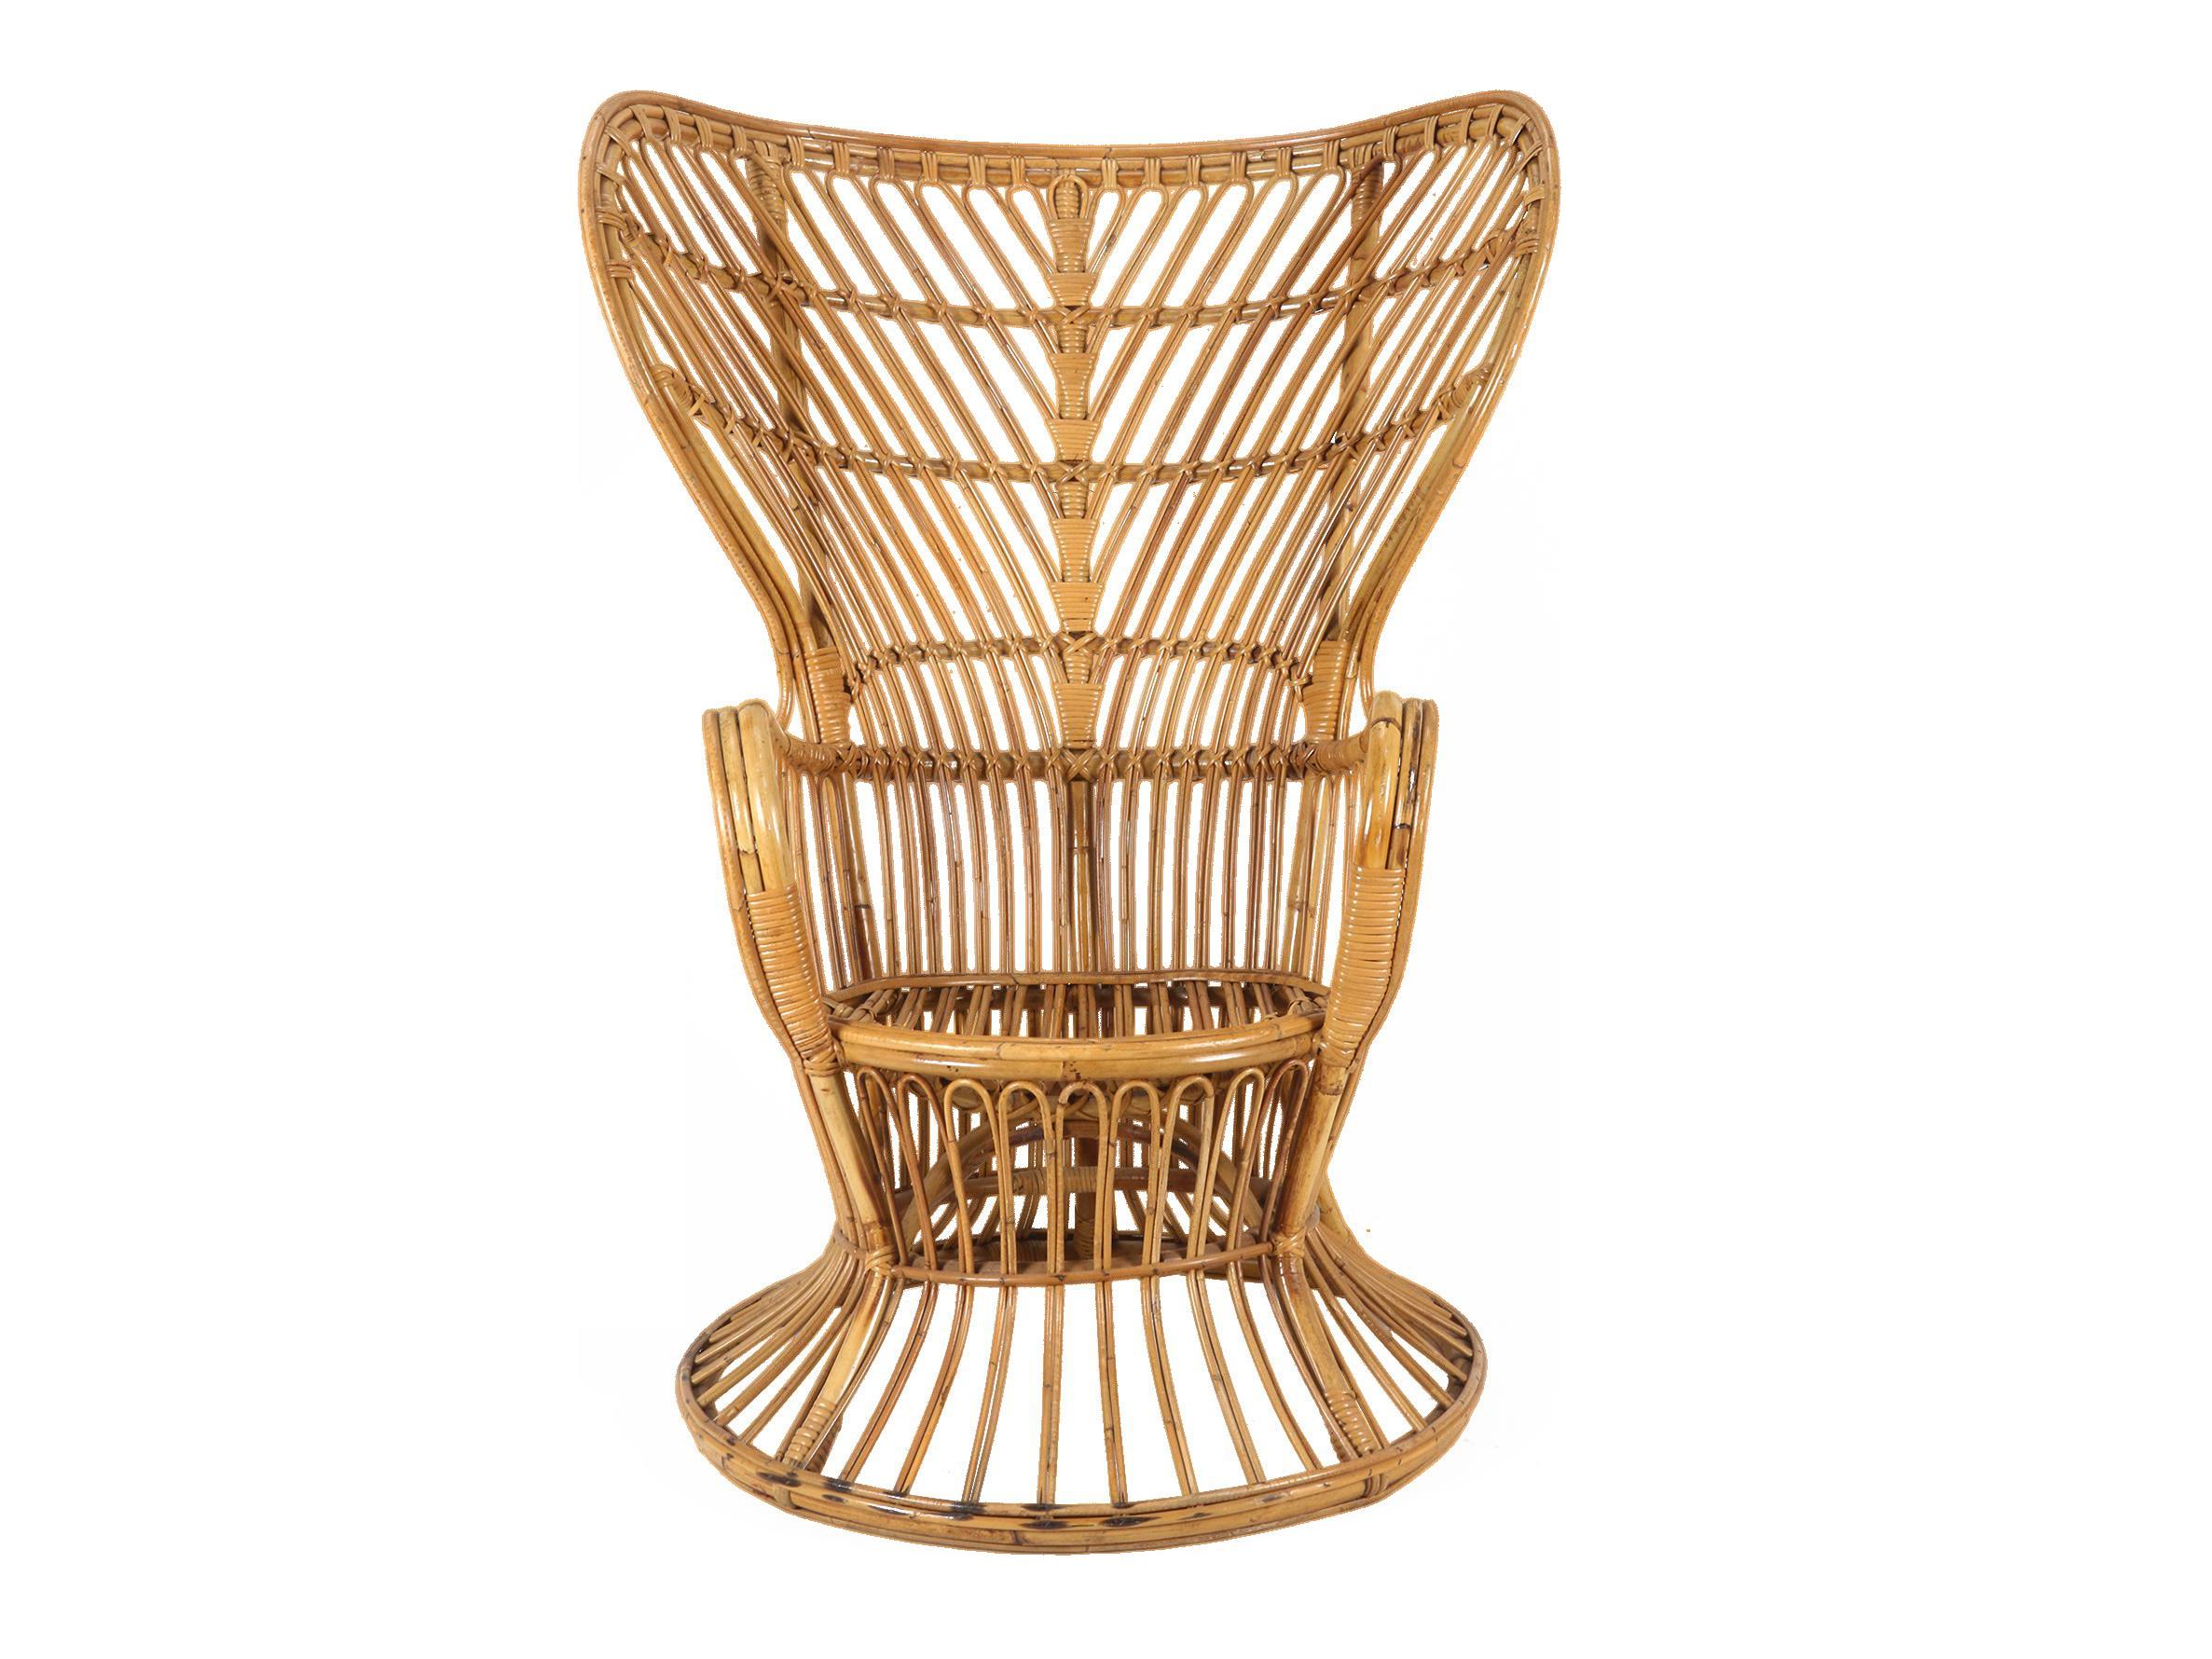 1950s Mid Century Modern Franco Albini Style Rattan Bamboo Peacock Chair